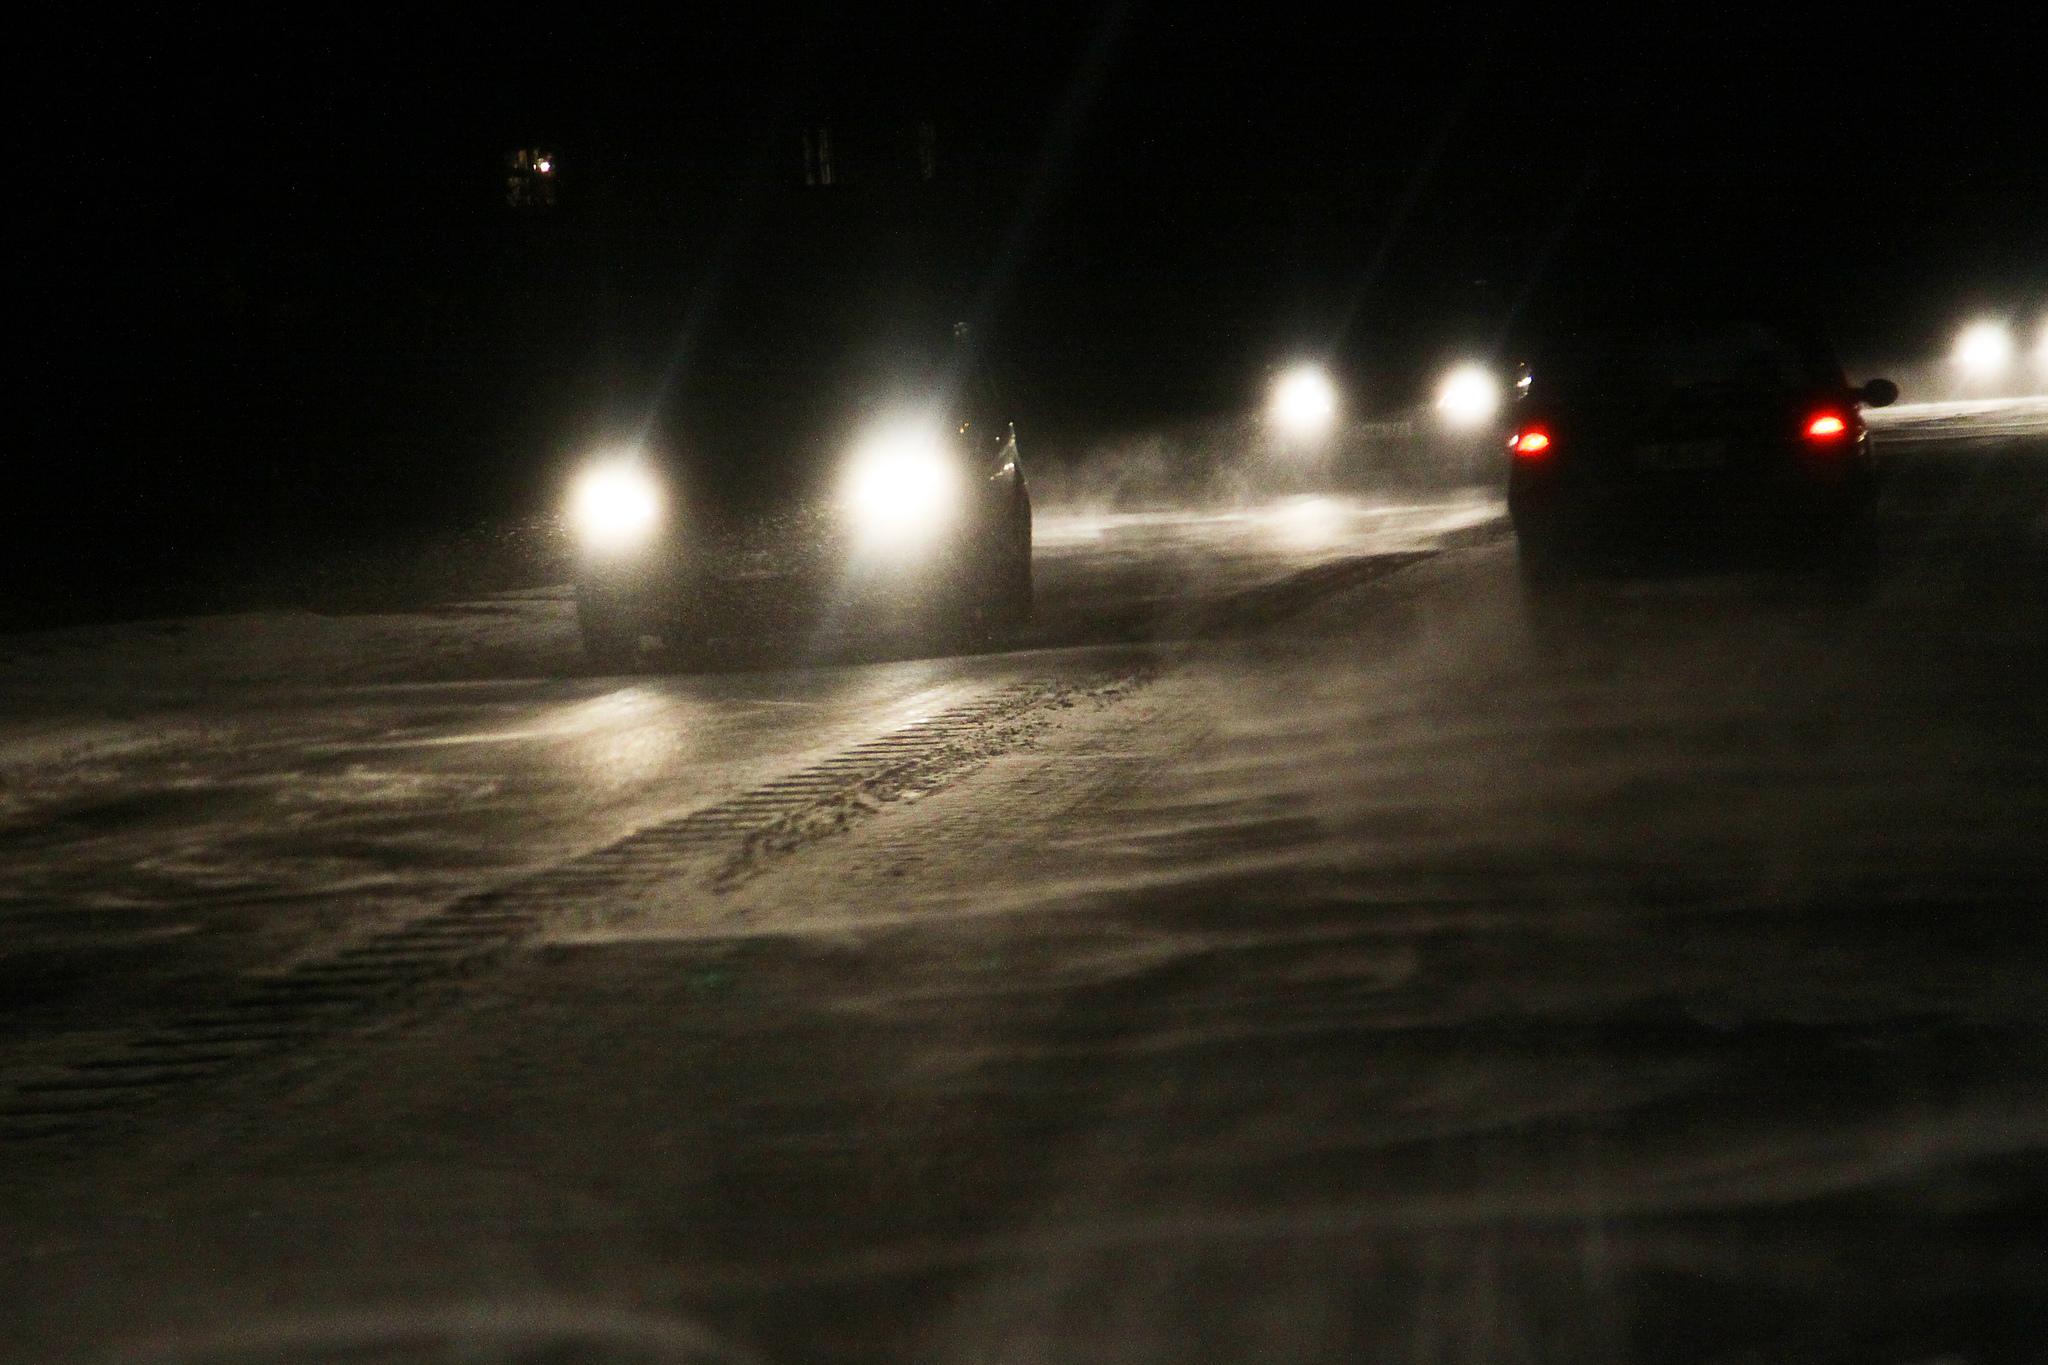 Liikenne, talvi, pimeä